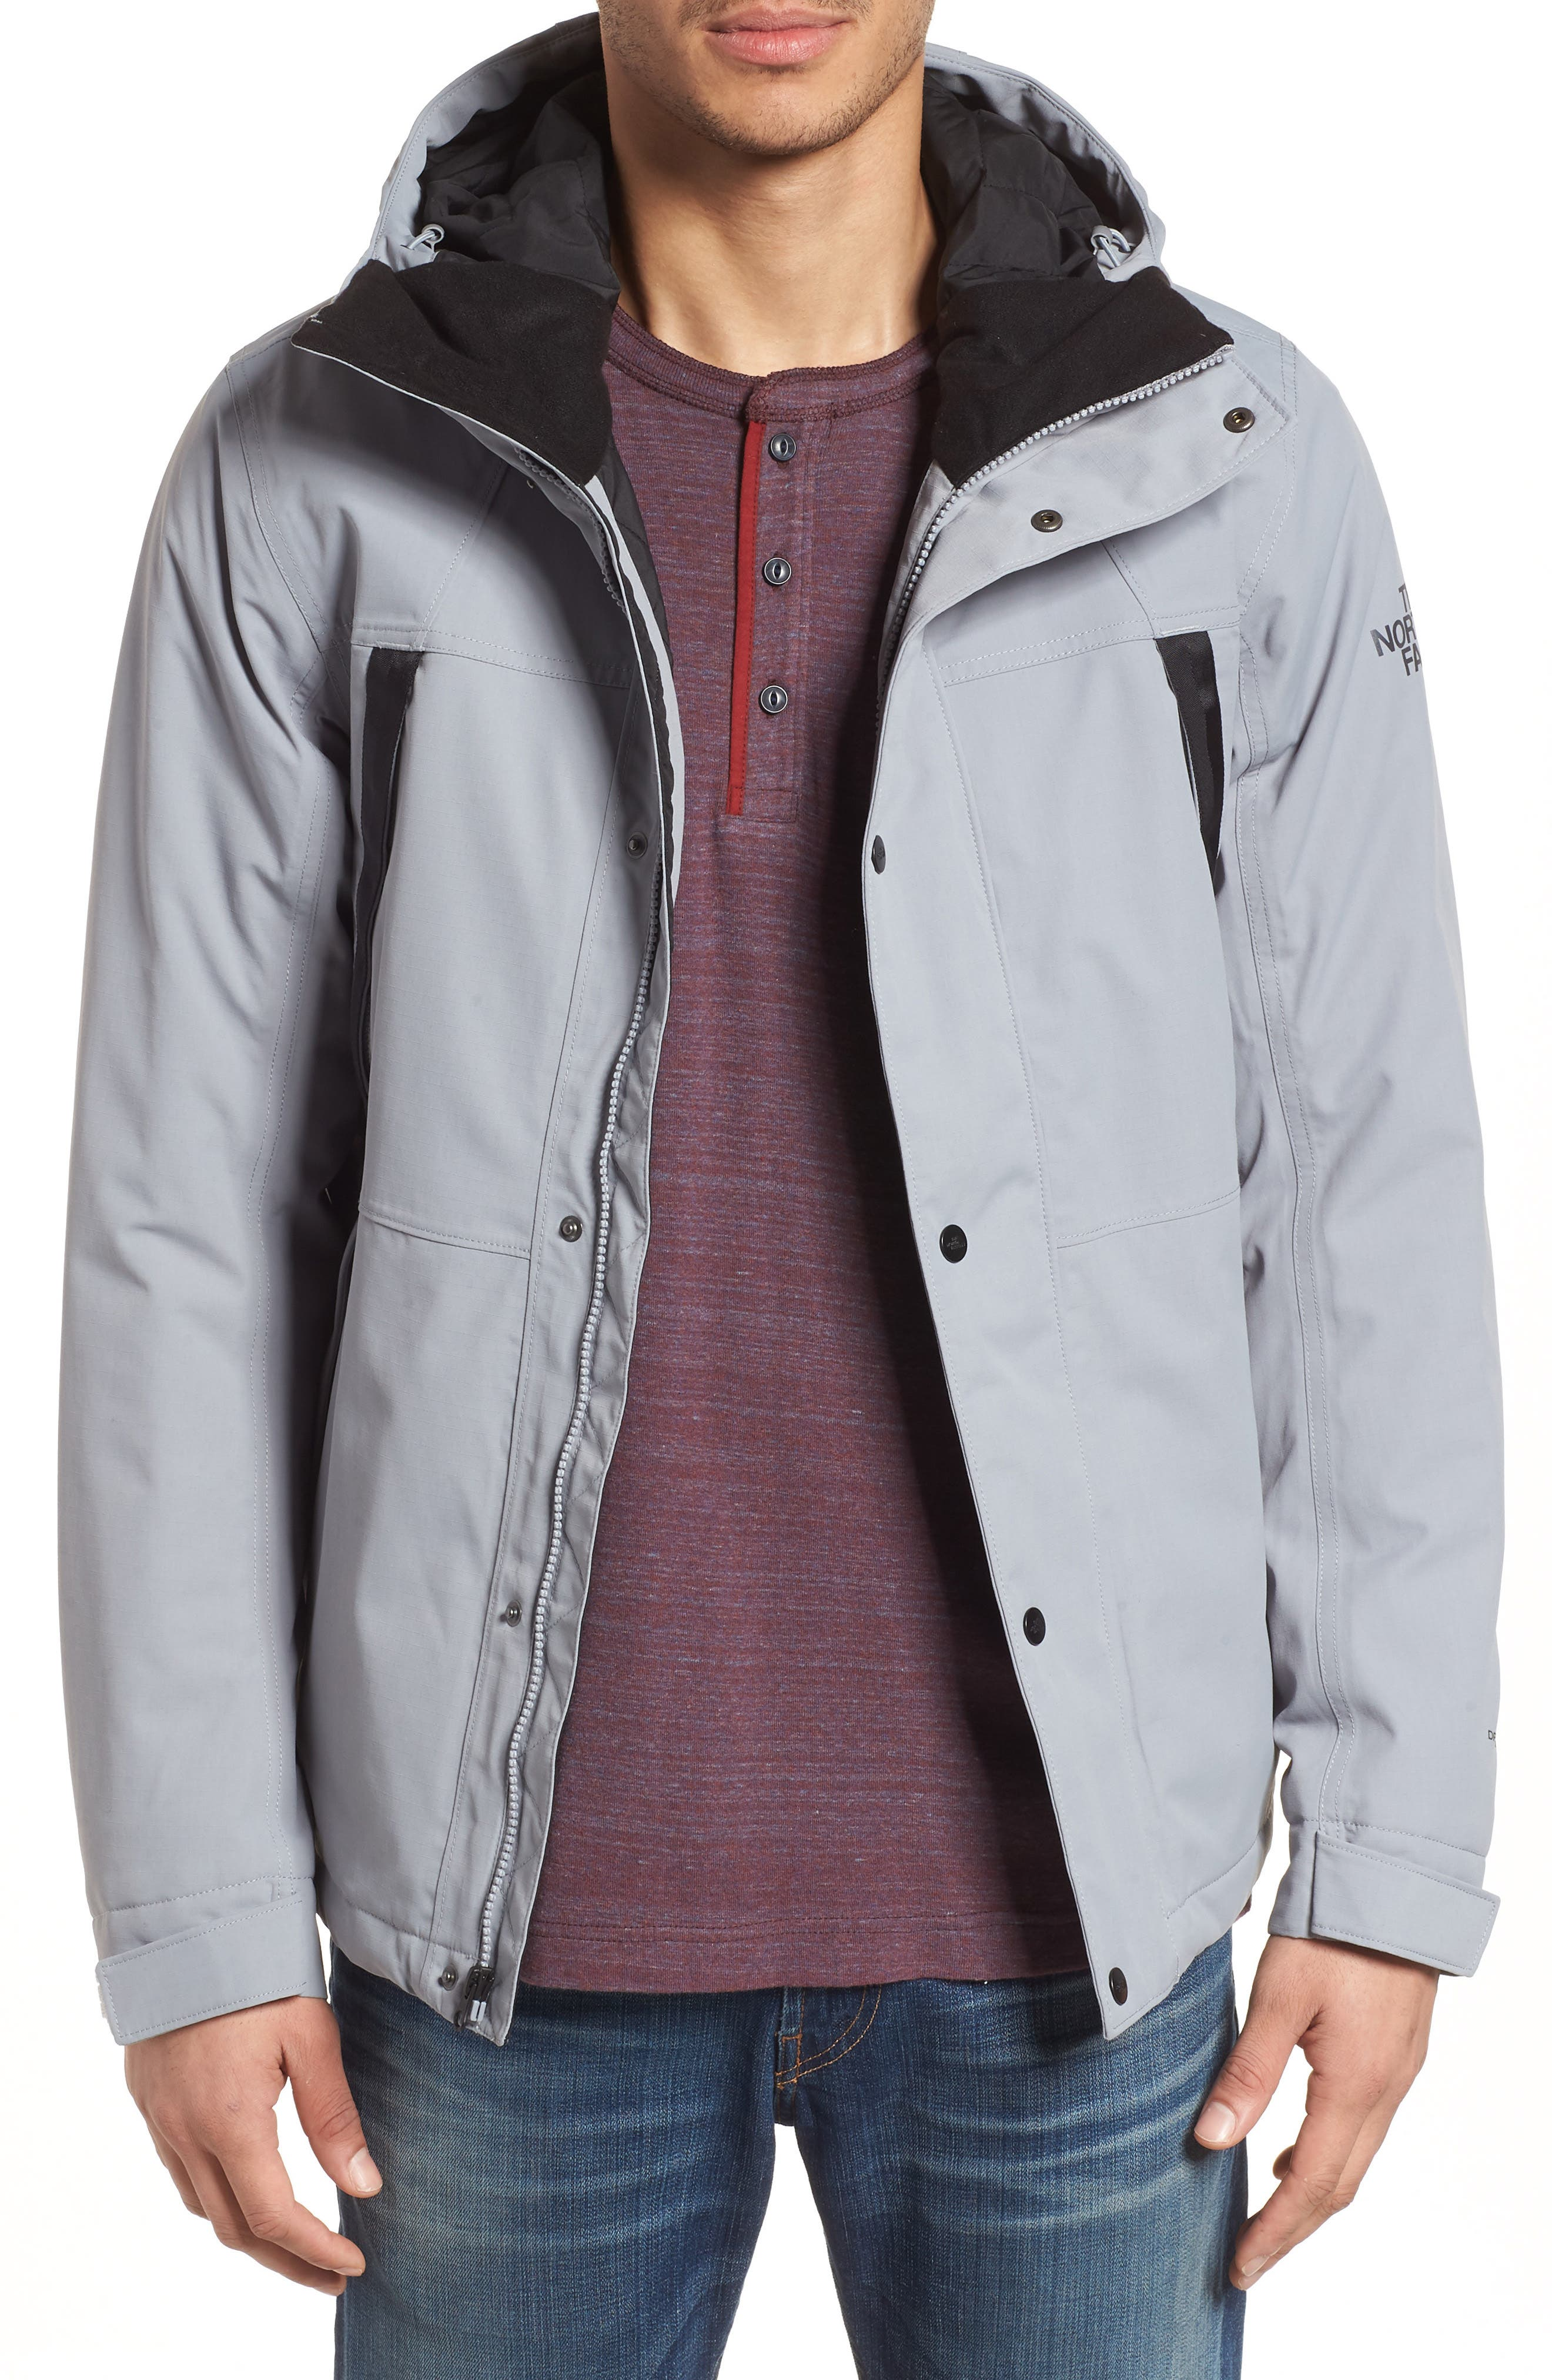 Stetler Insulated Rain Jacket,                         Main,                         color, MID GREY